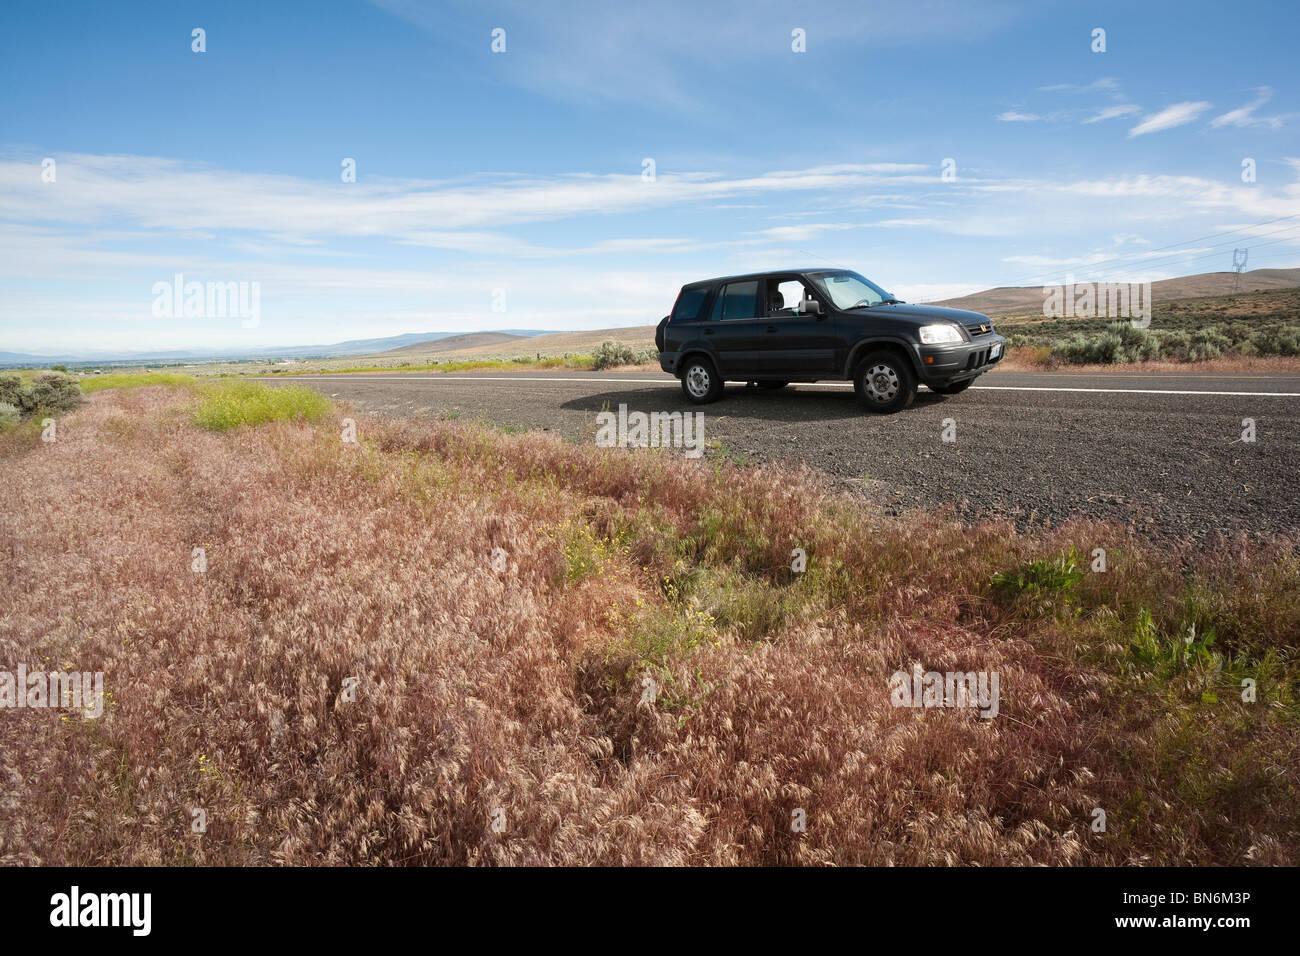 Car parked along the Vantage Highway near Ellensburg - Kittitas County, Washington - Stock Image